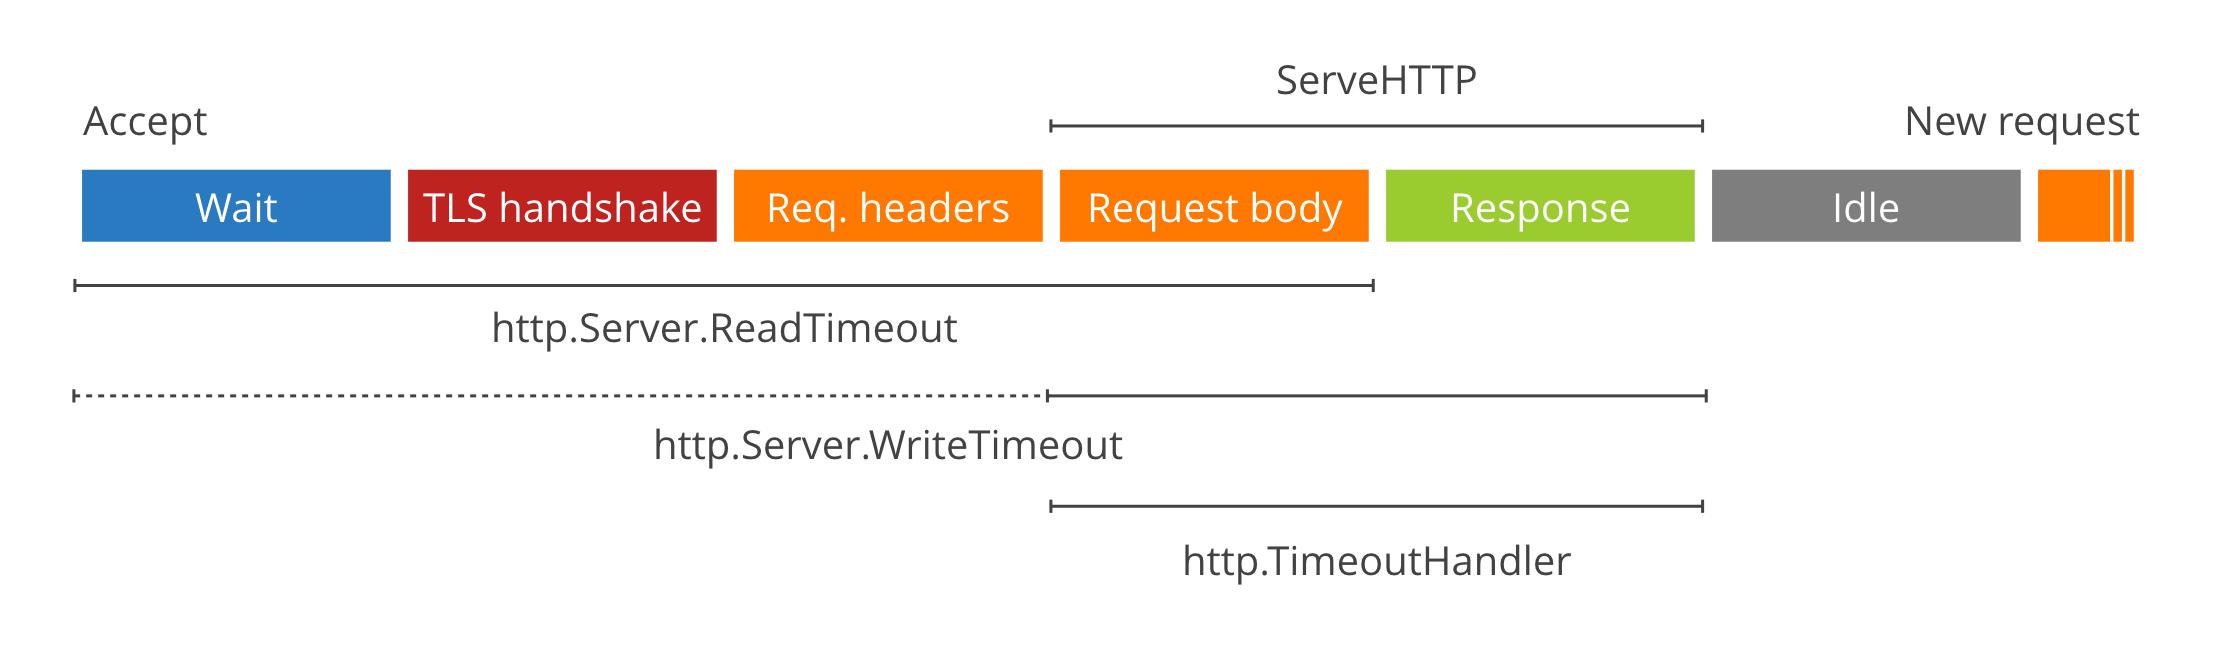 Server timeouts